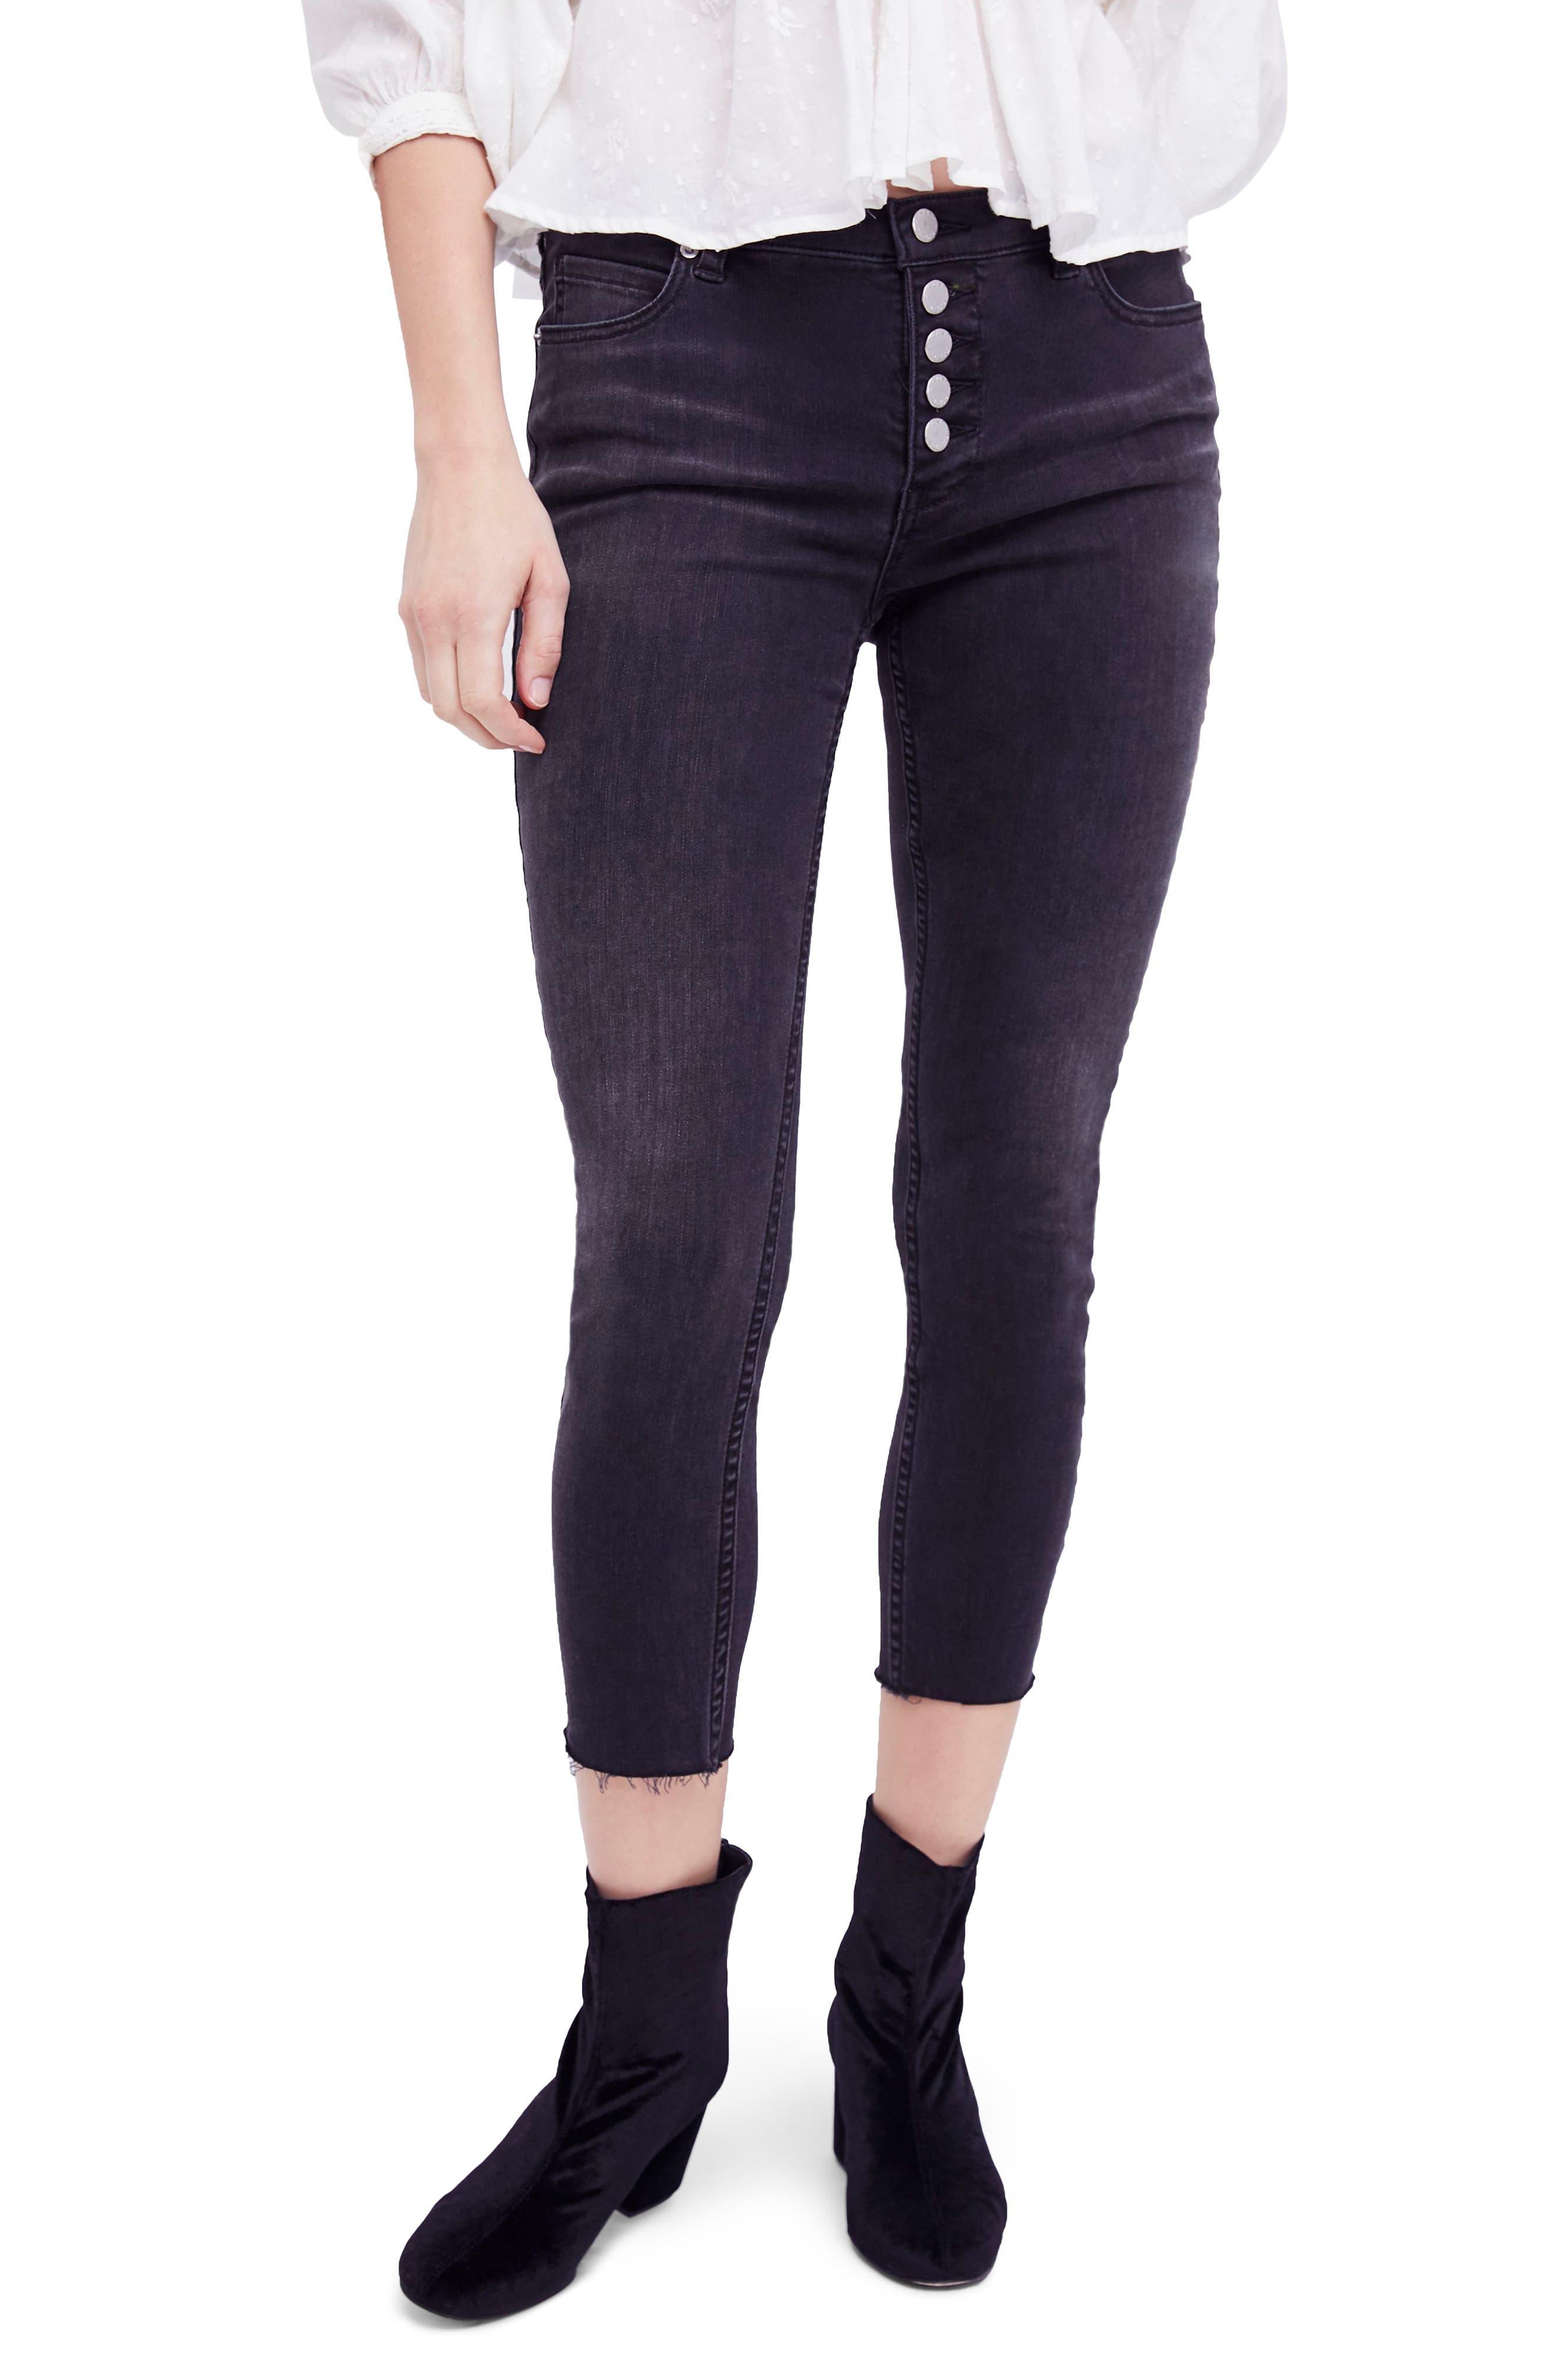 Reagan Crop Skinny Jeans,                         Main,                         color, Black